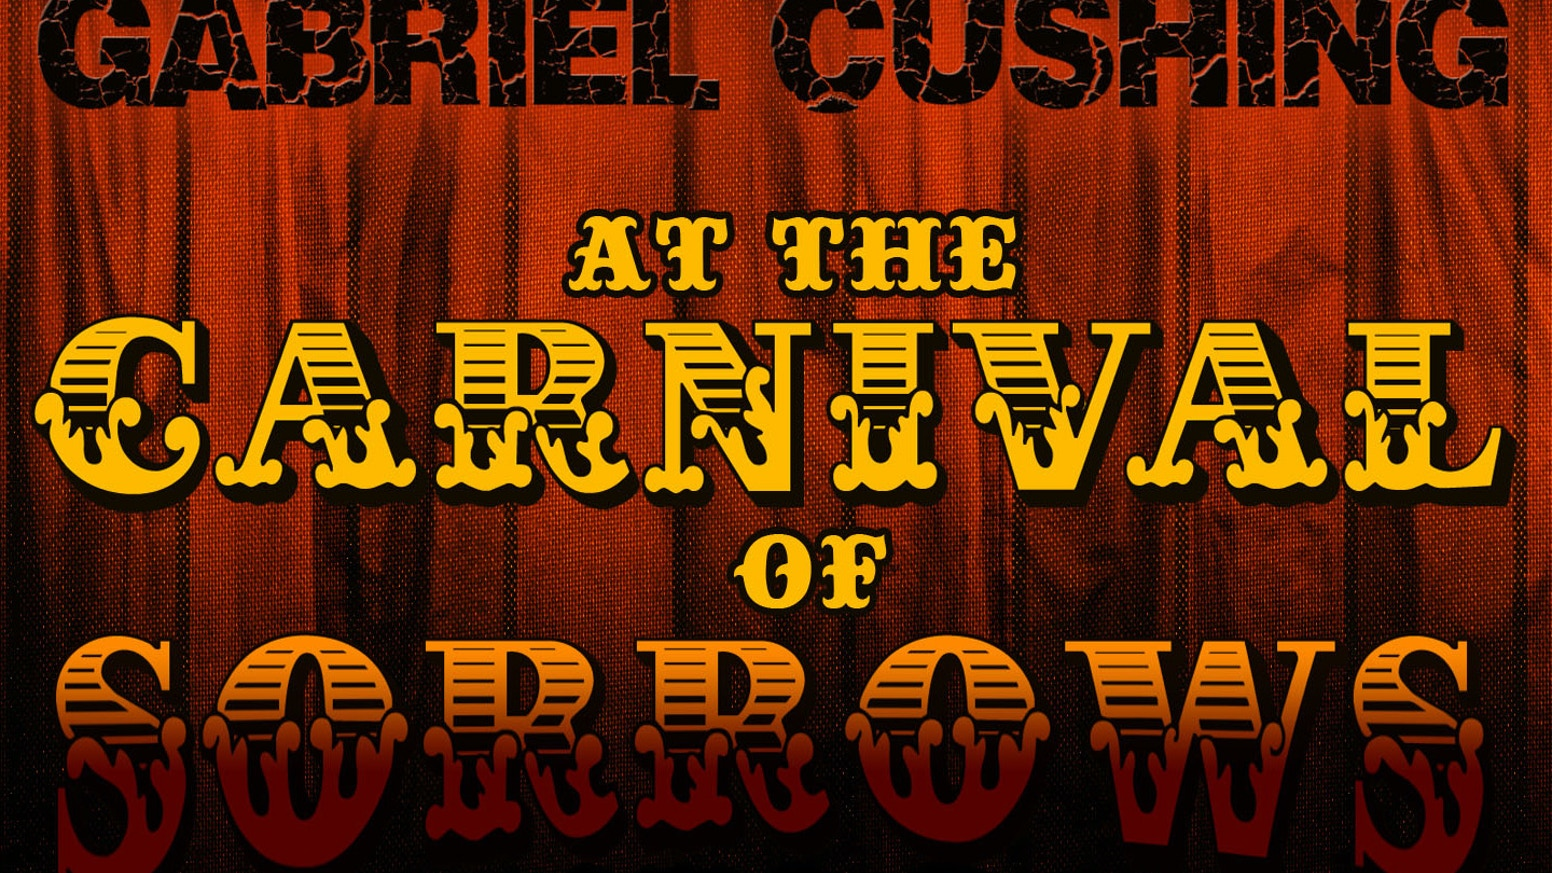 Gabriel Cushing at the Carnival of Sorrows (Web Series) by